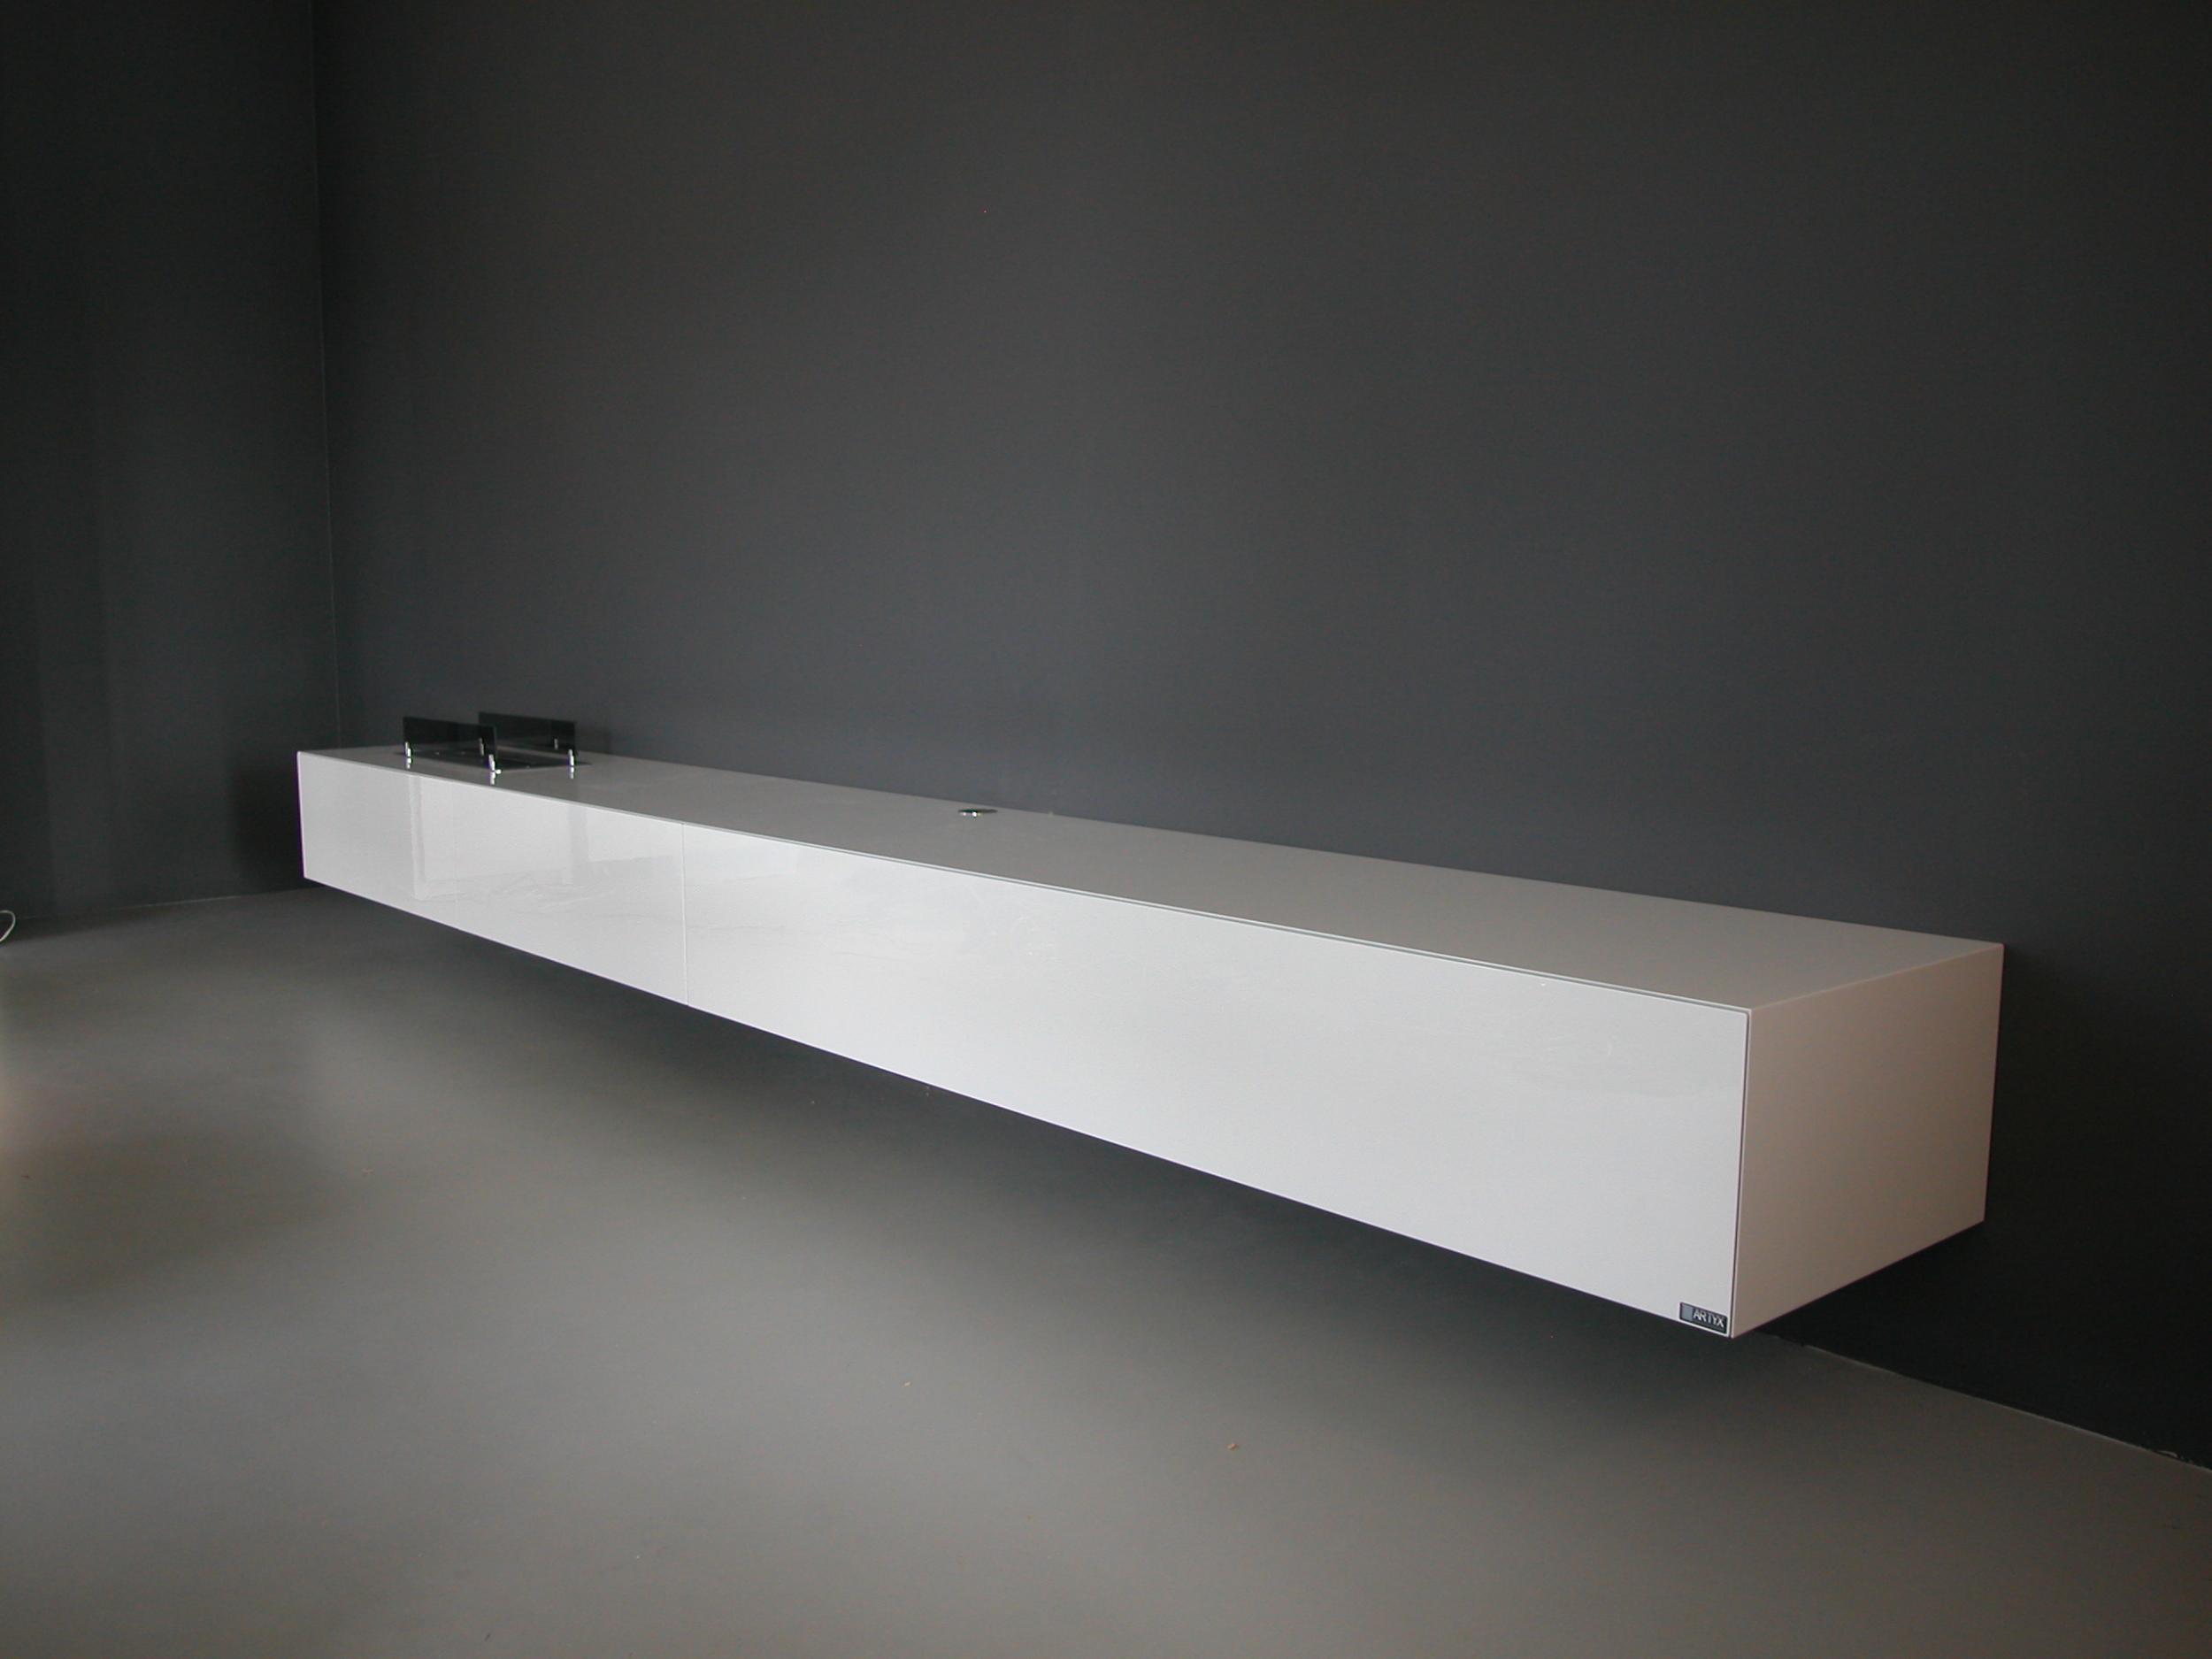 Artyx The New Design Vision Alpha 380 Super Lang